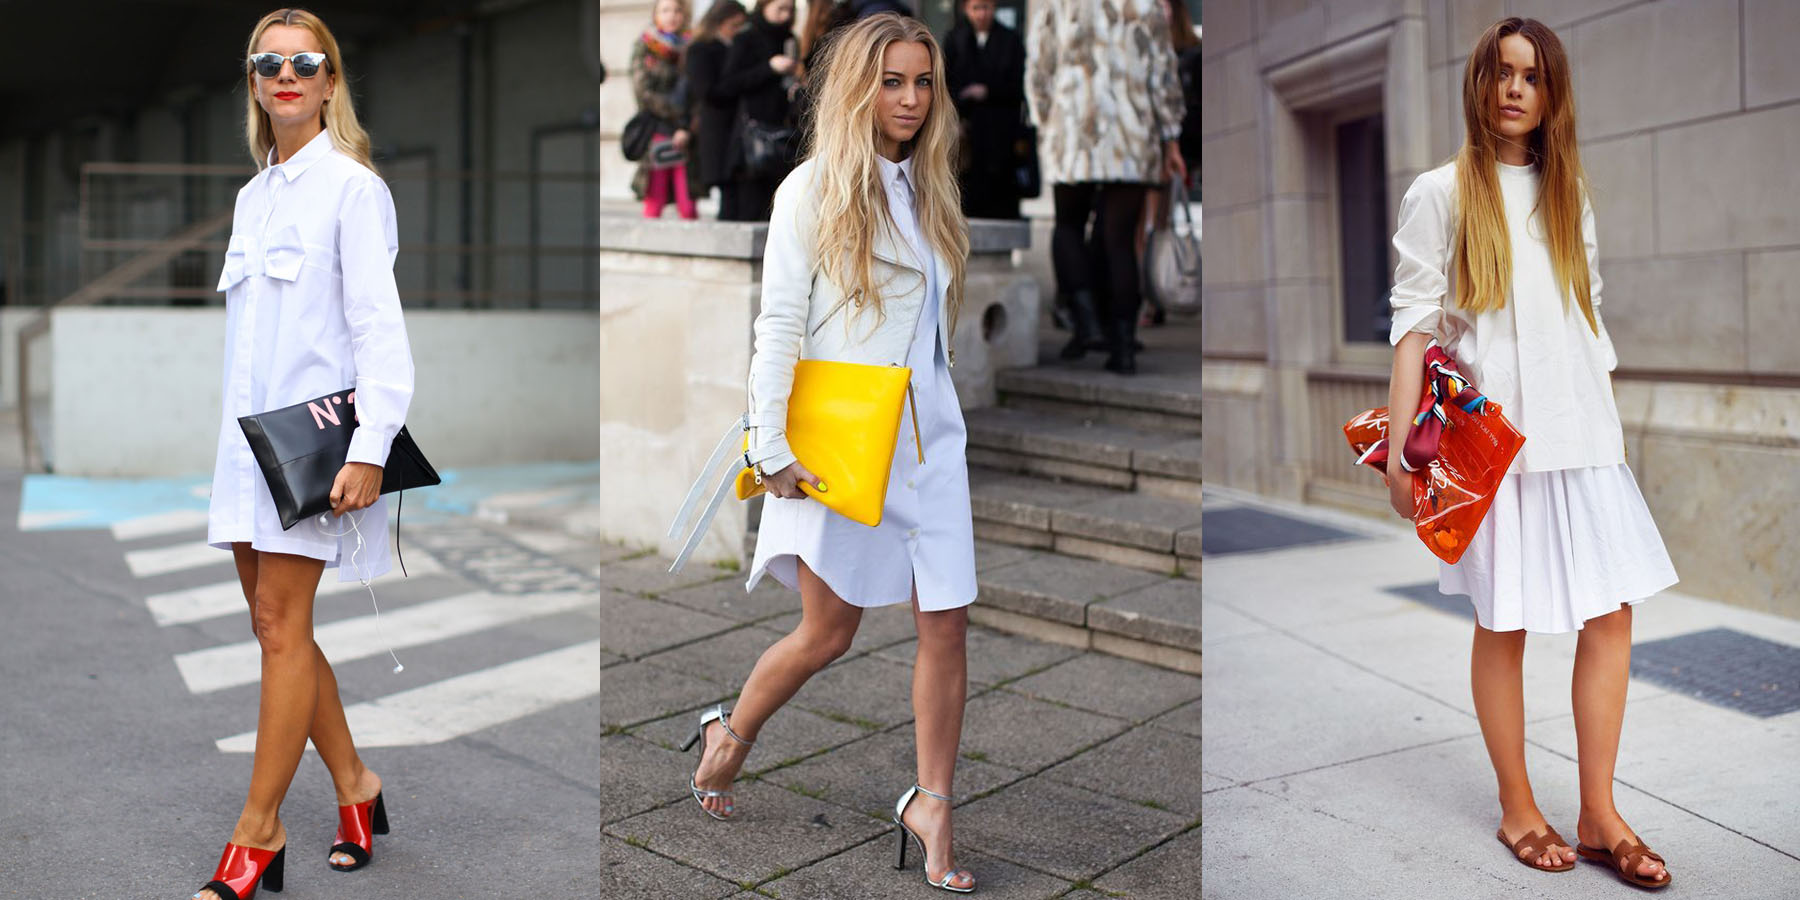 Yuk, Tampil Lebih Chic dengan White Dress!